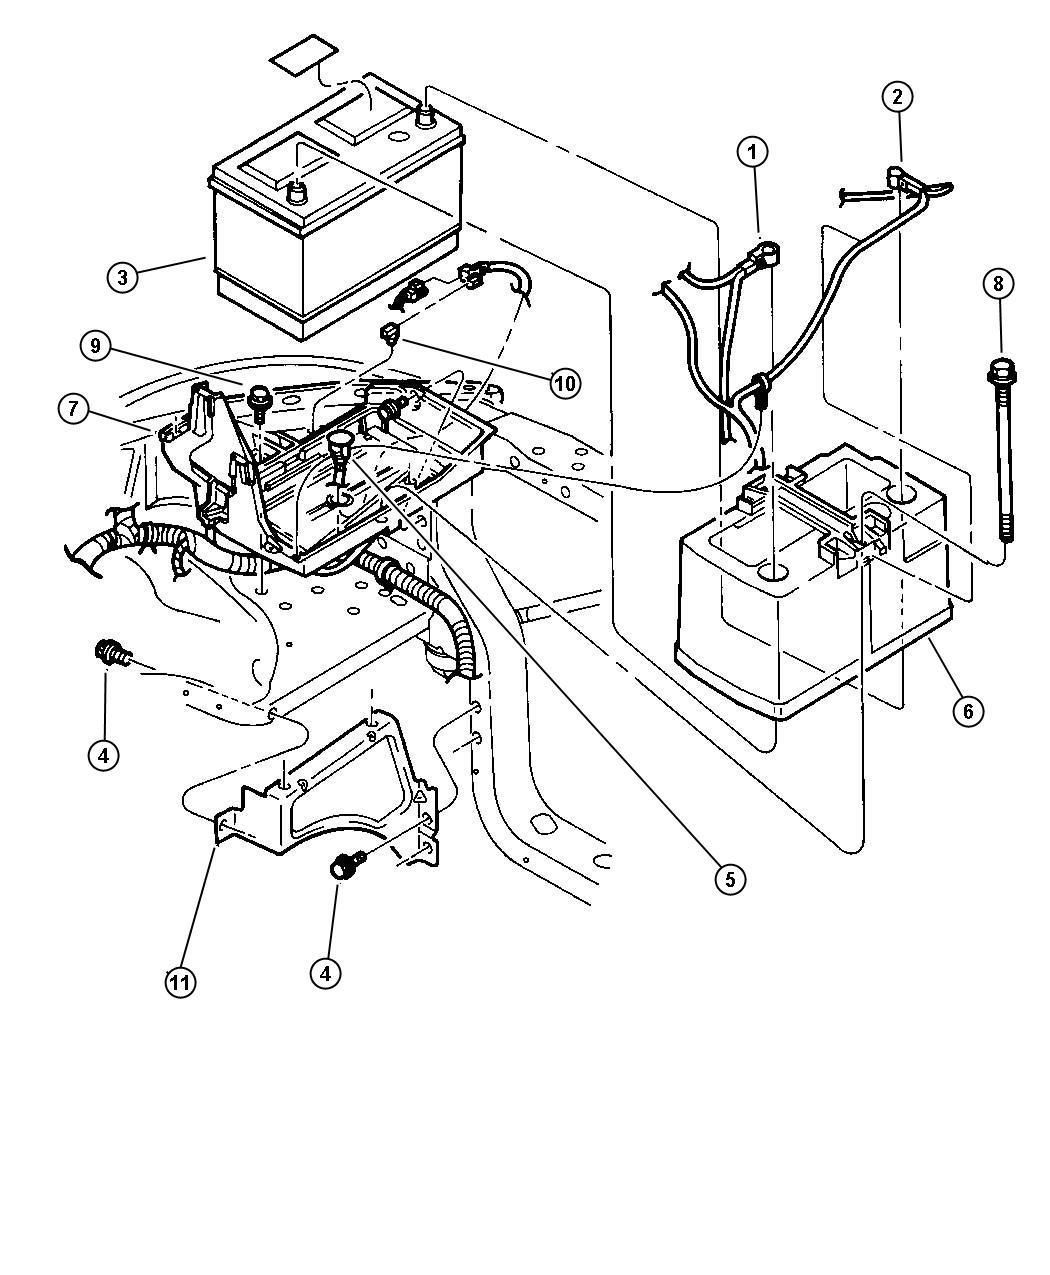 2007 Chrysler Sebring Battery. Storage. [bce], 600 Cca